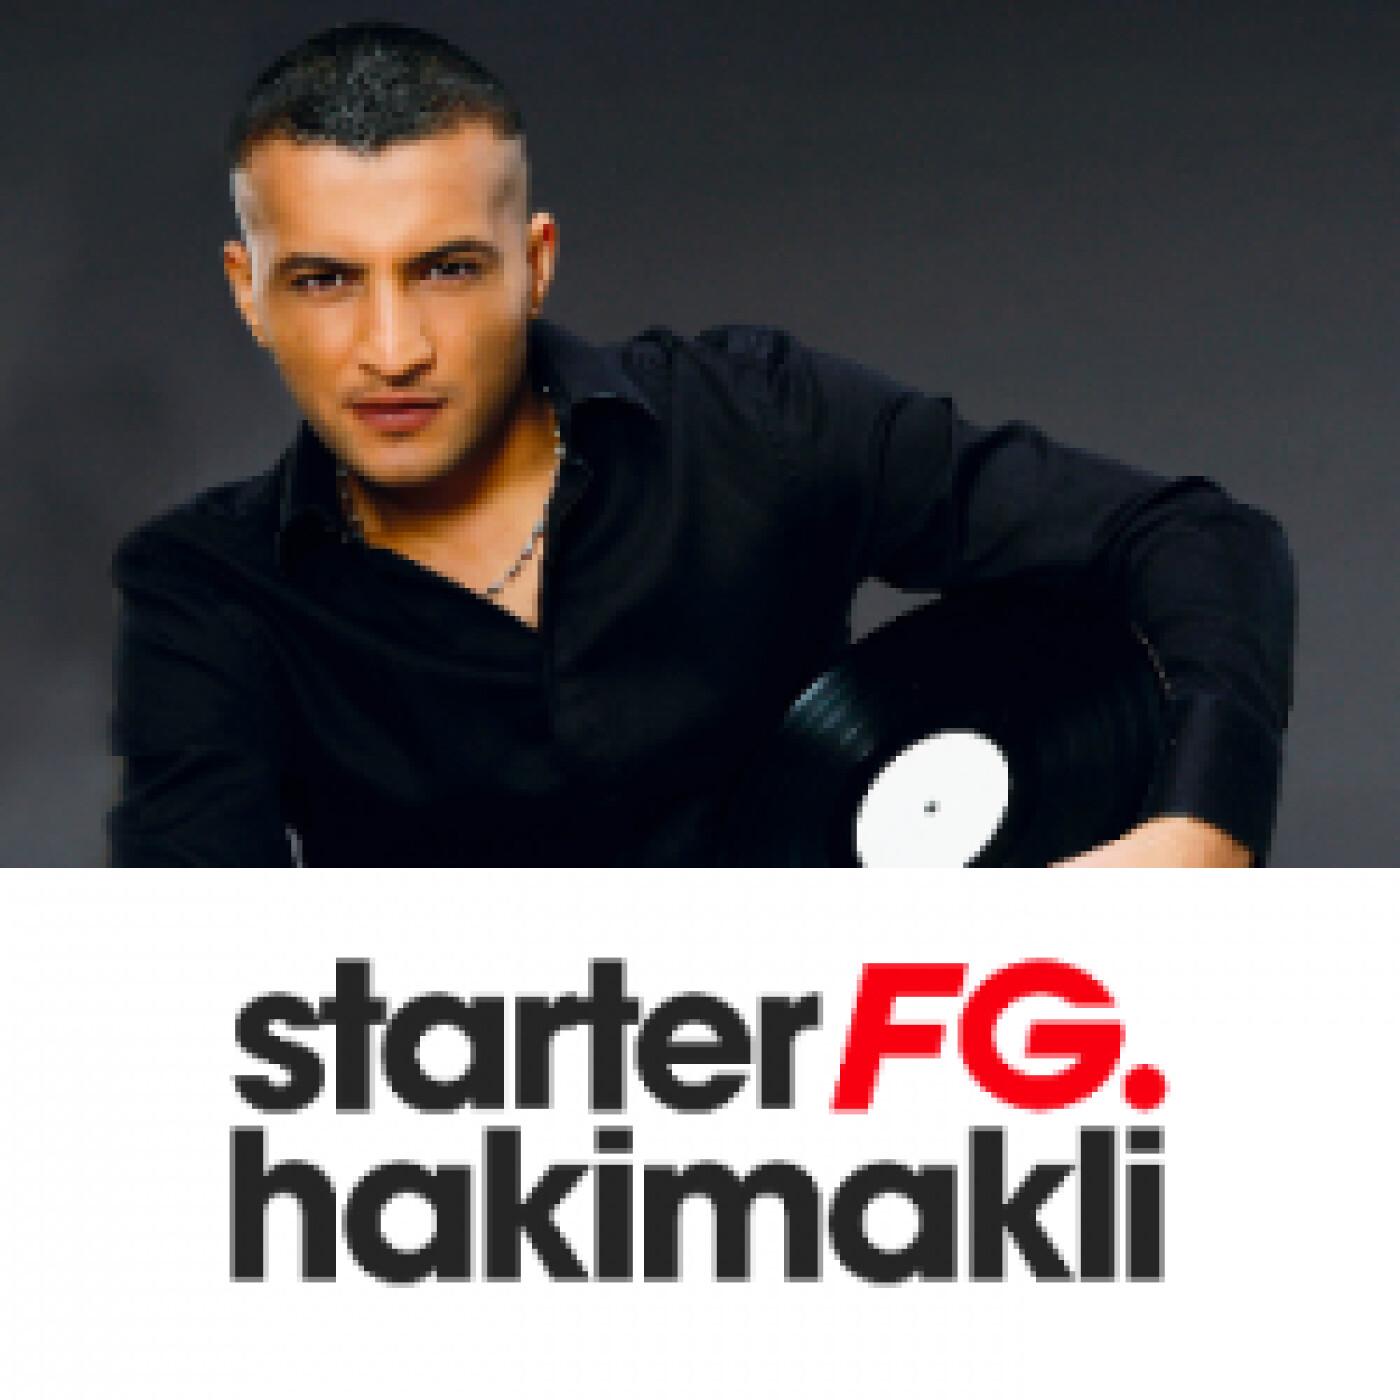 STARTER FG BY HAKIMAKLI MERCREDI 24 FEVRIER 2021